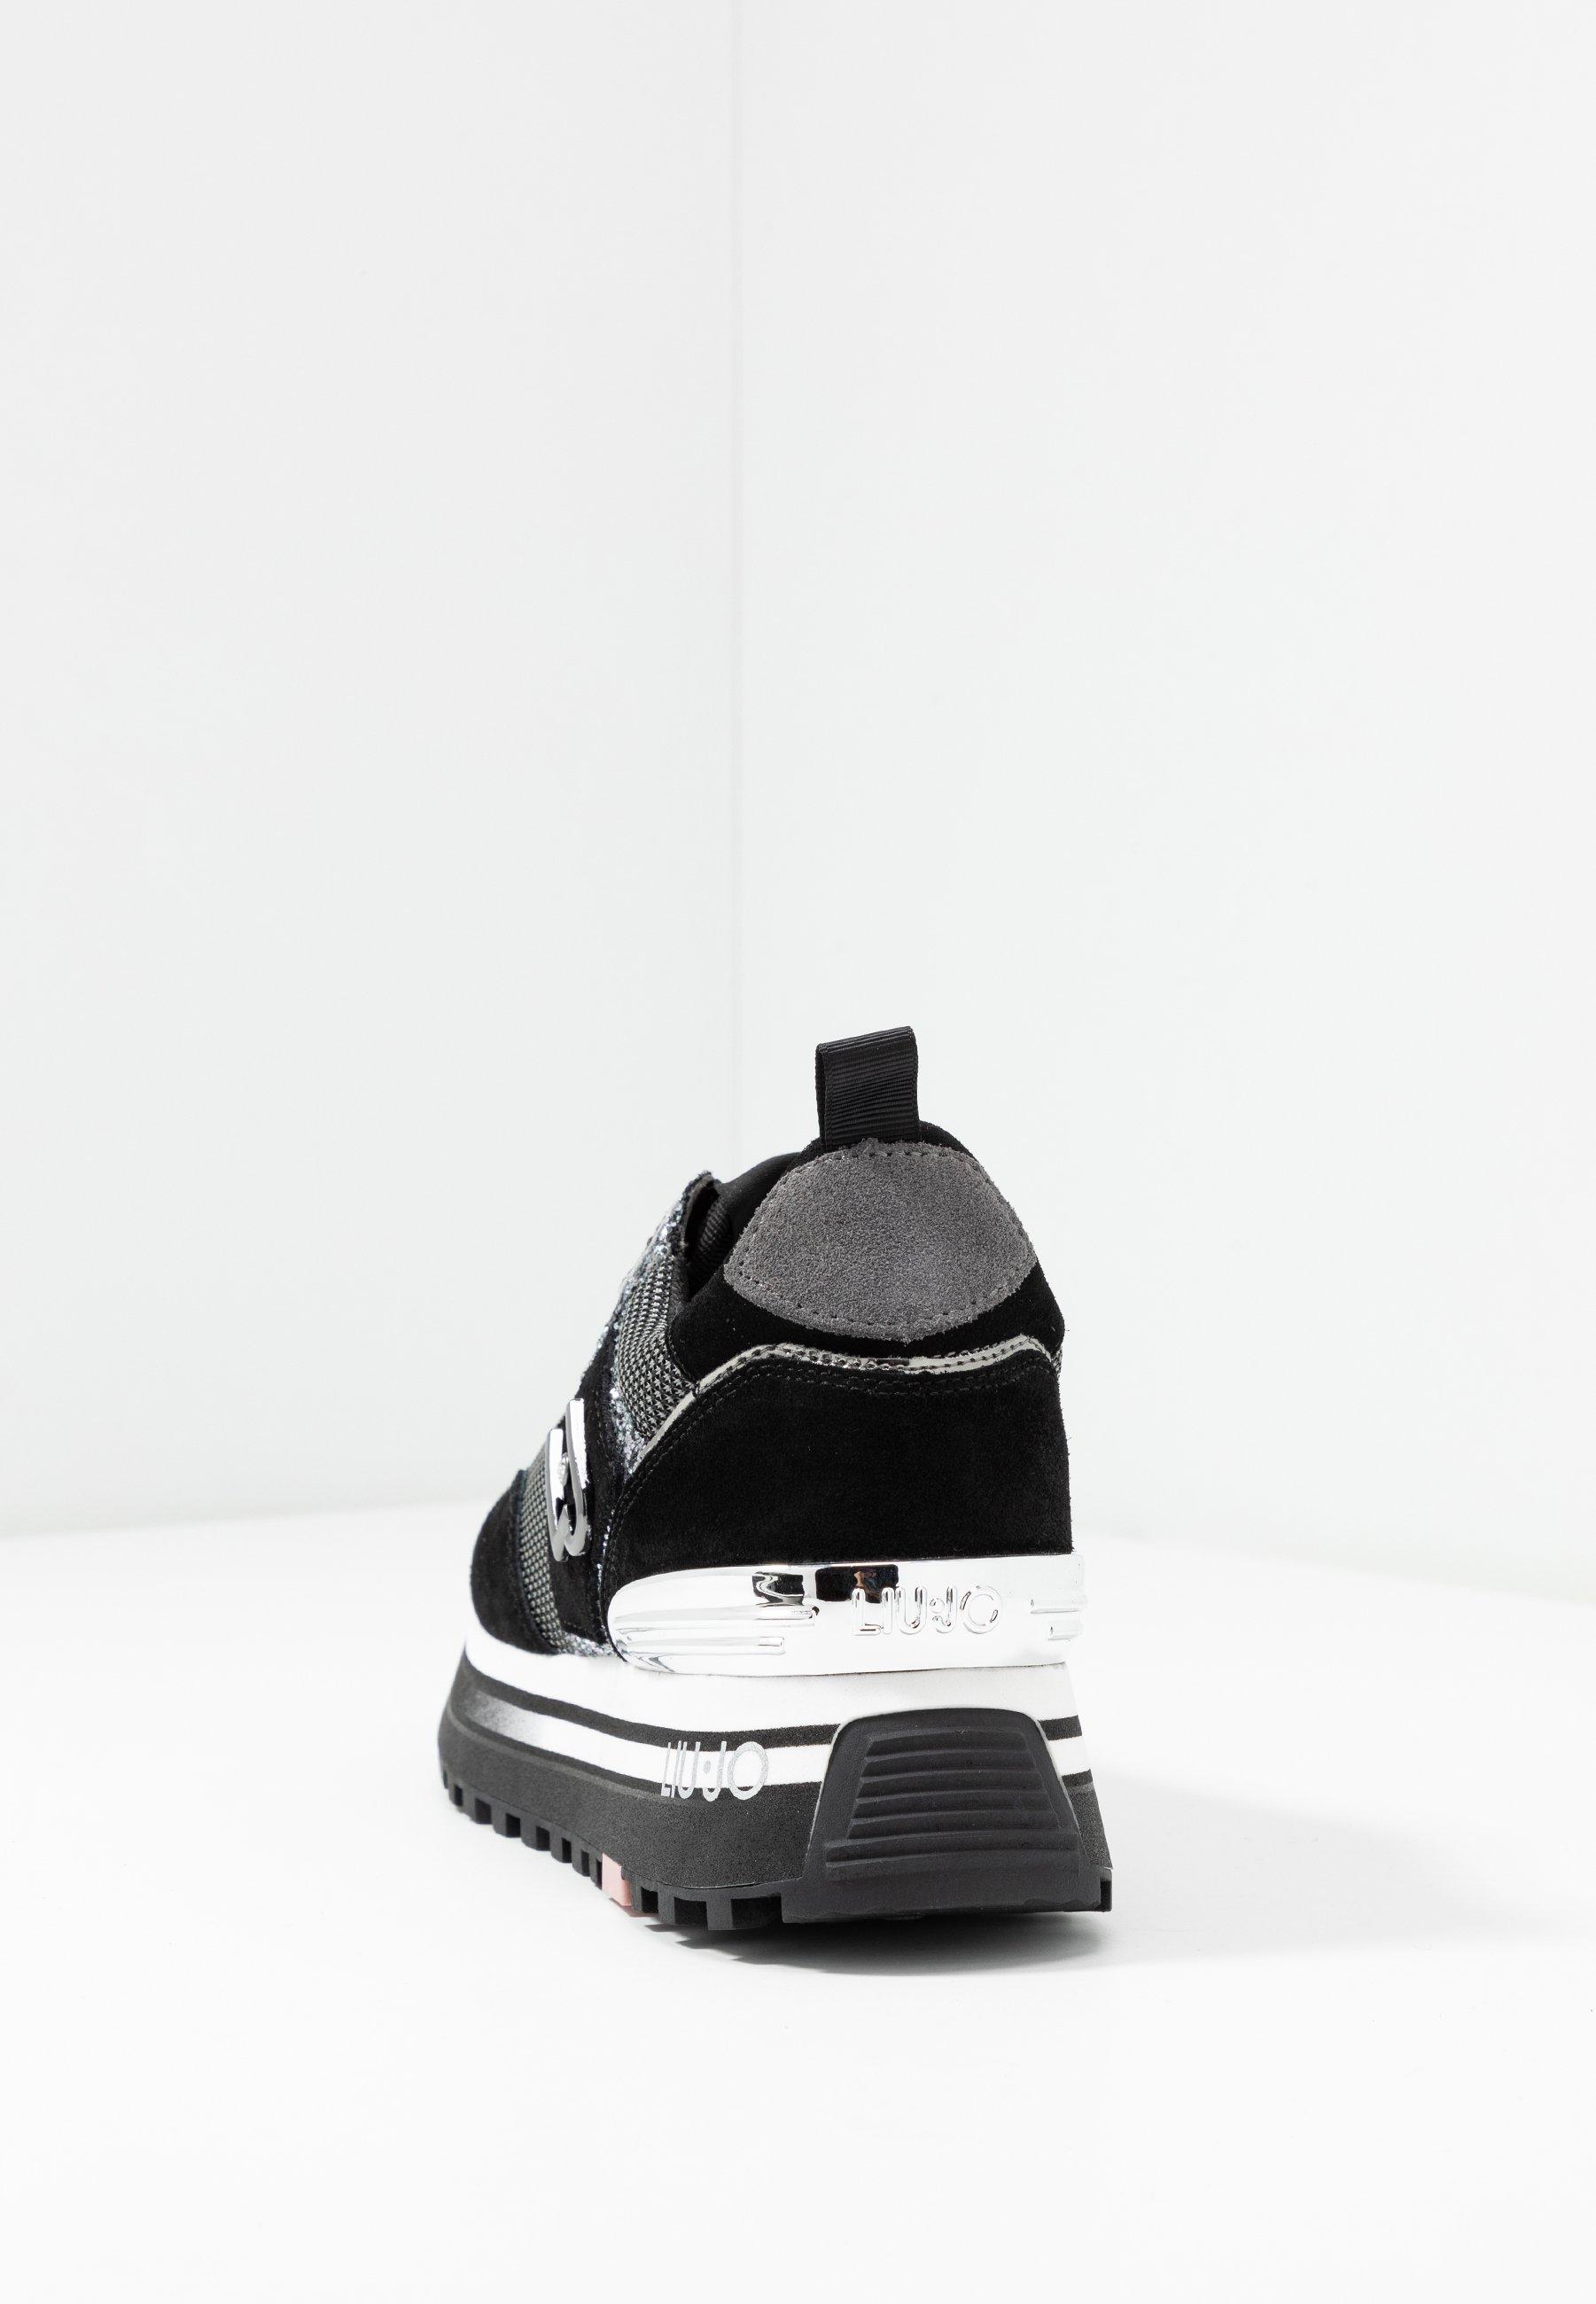 Liu Jo Jeans Maxi - Sneakers Basse Black 5wLWj